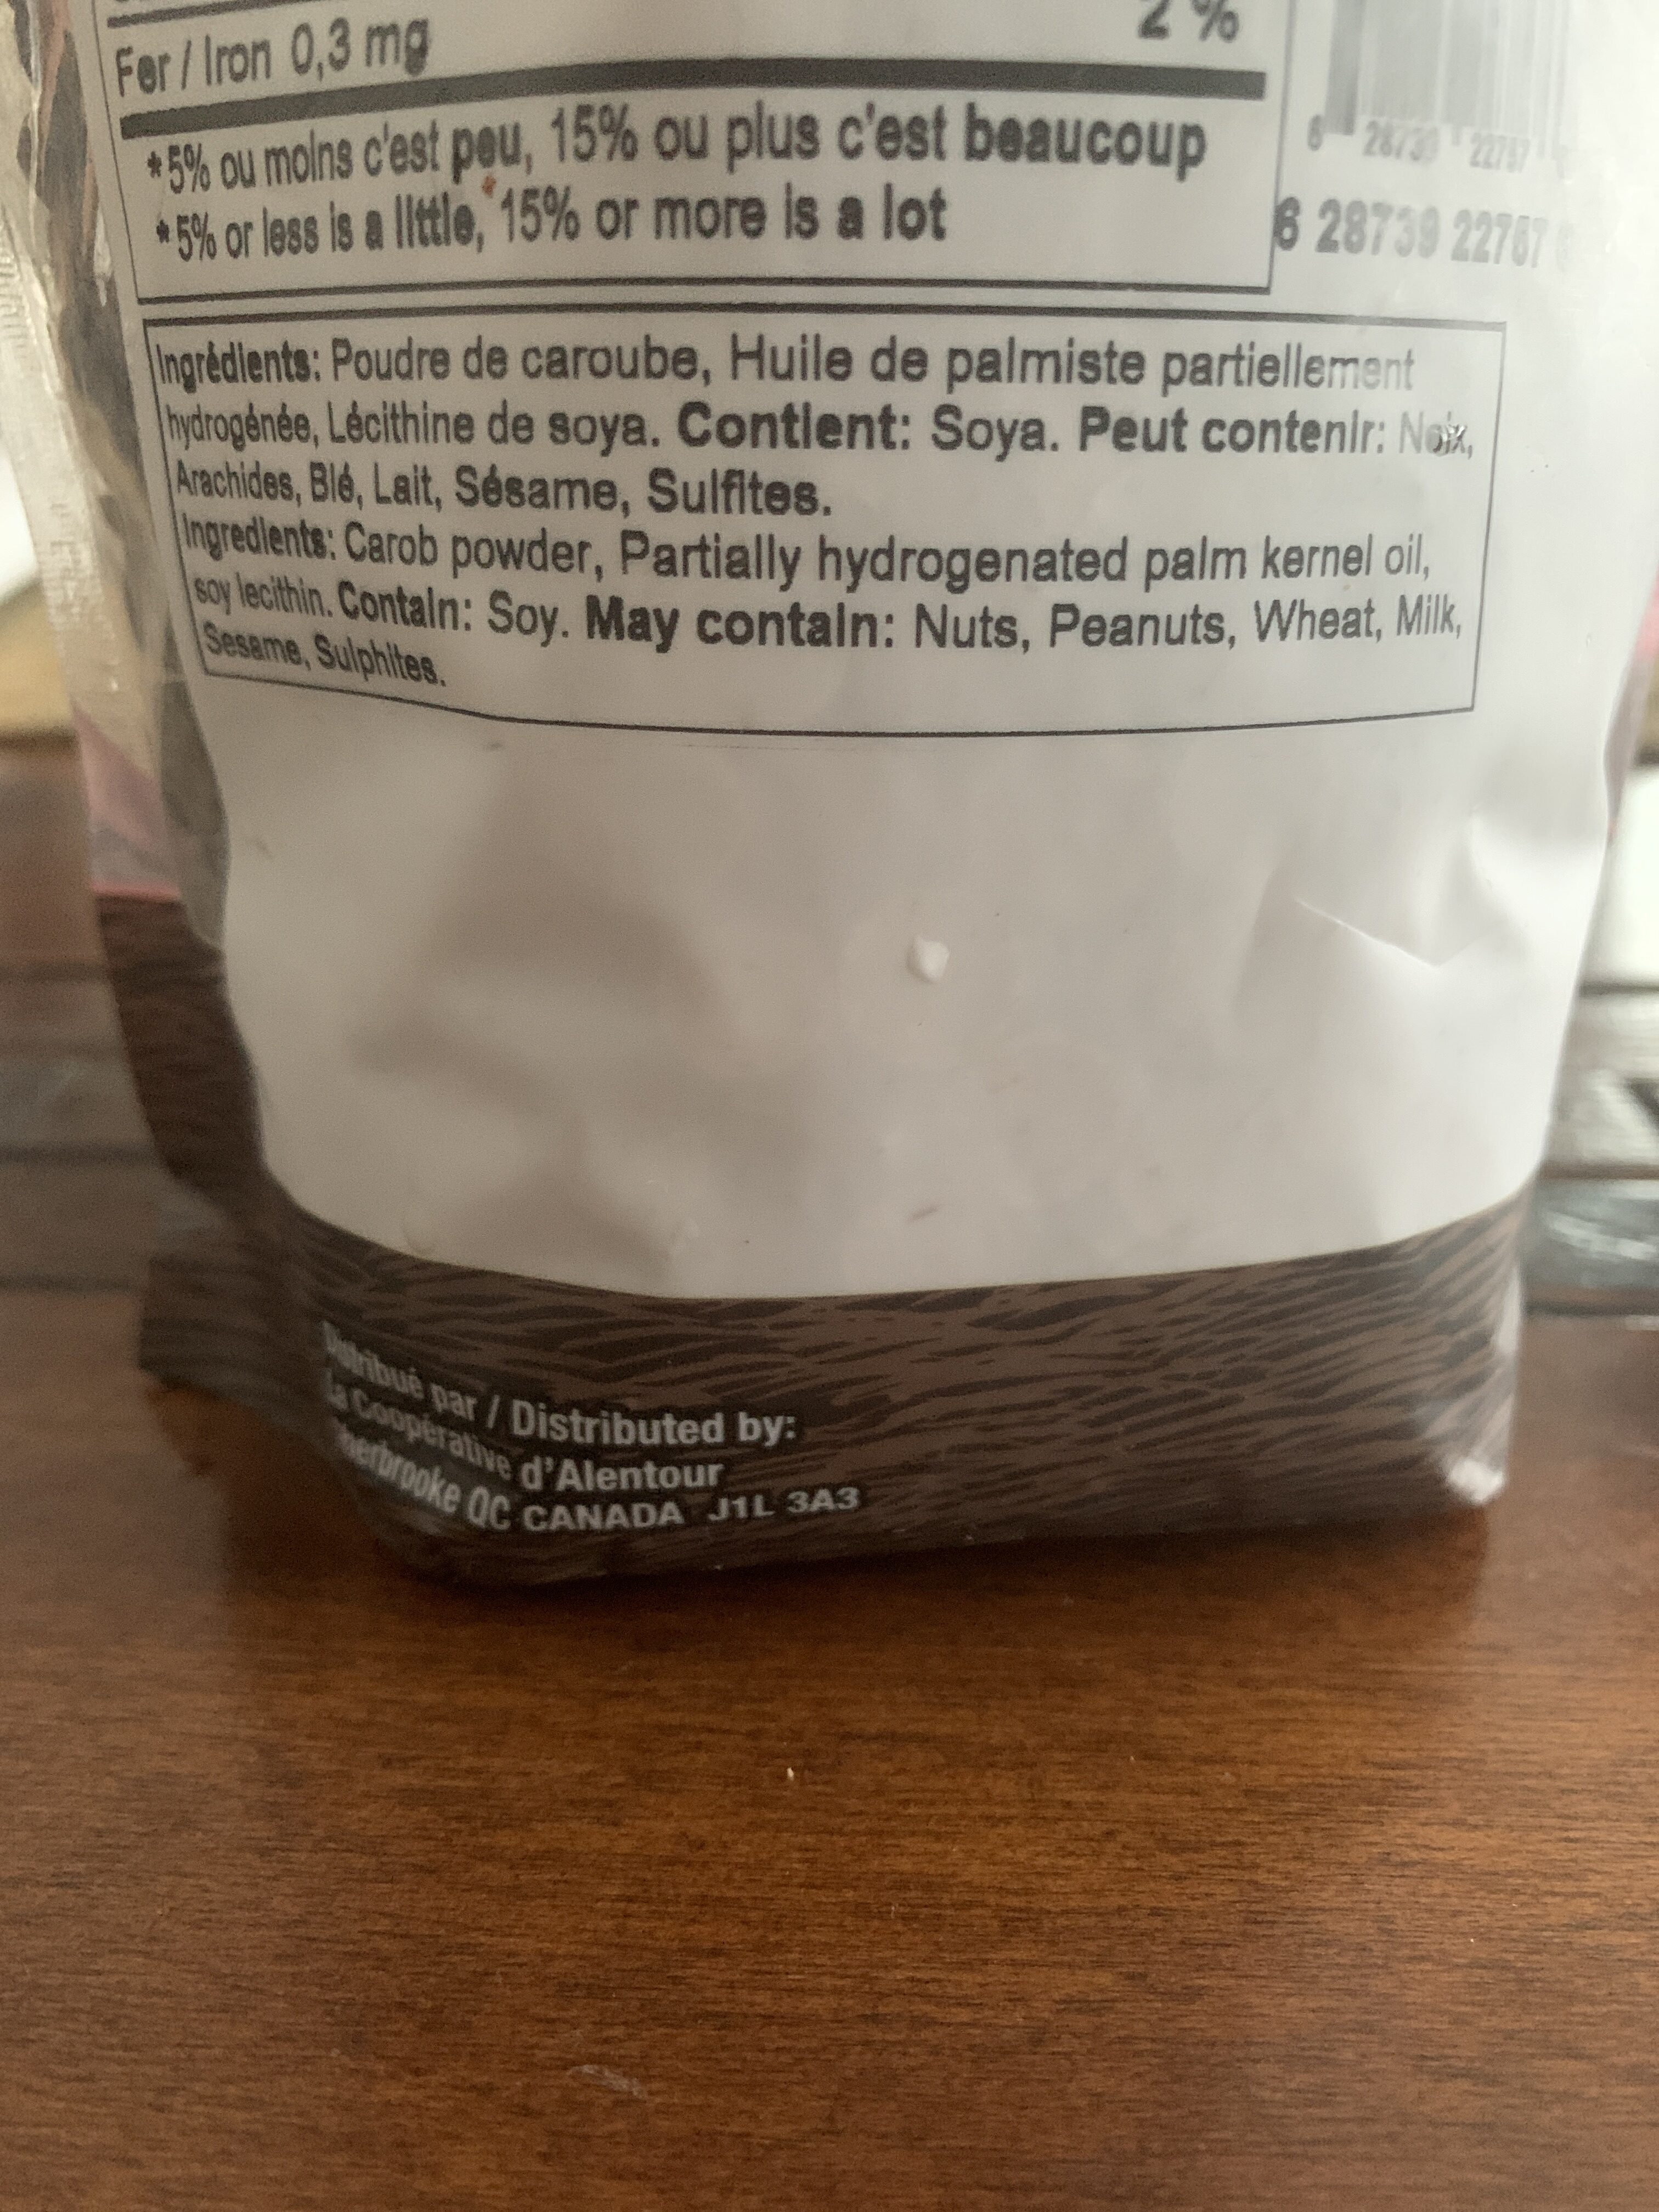 Brisures de caroubes - Ingredients - fr